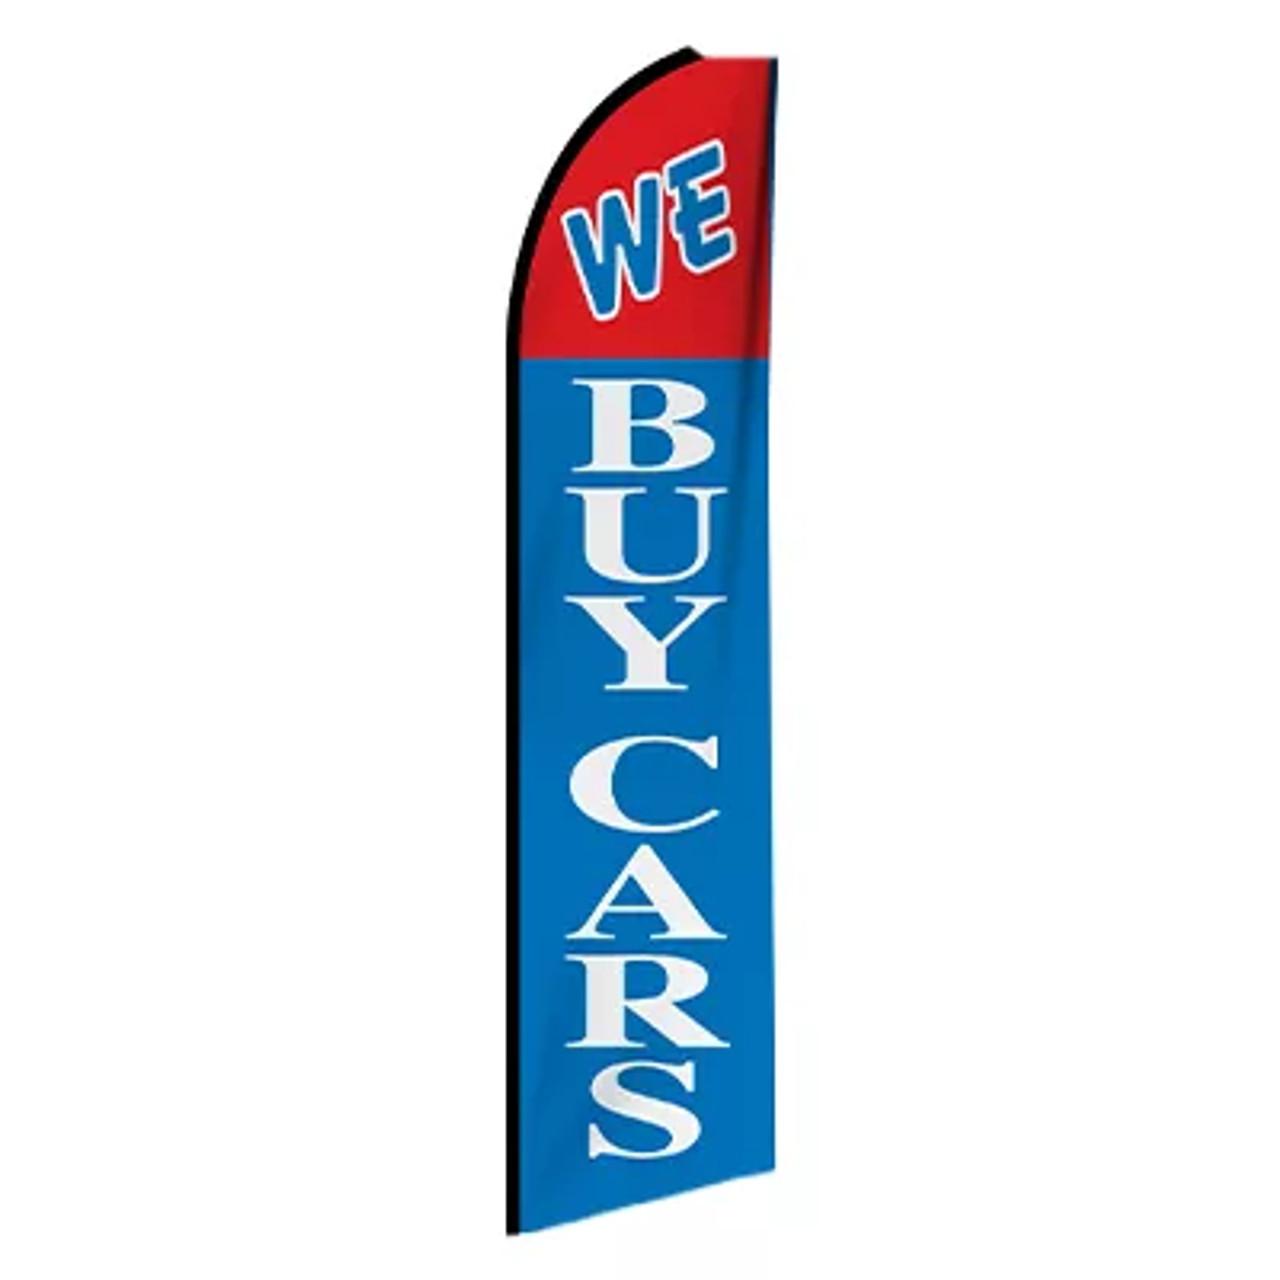 Swooper Flag - We Buy Cars